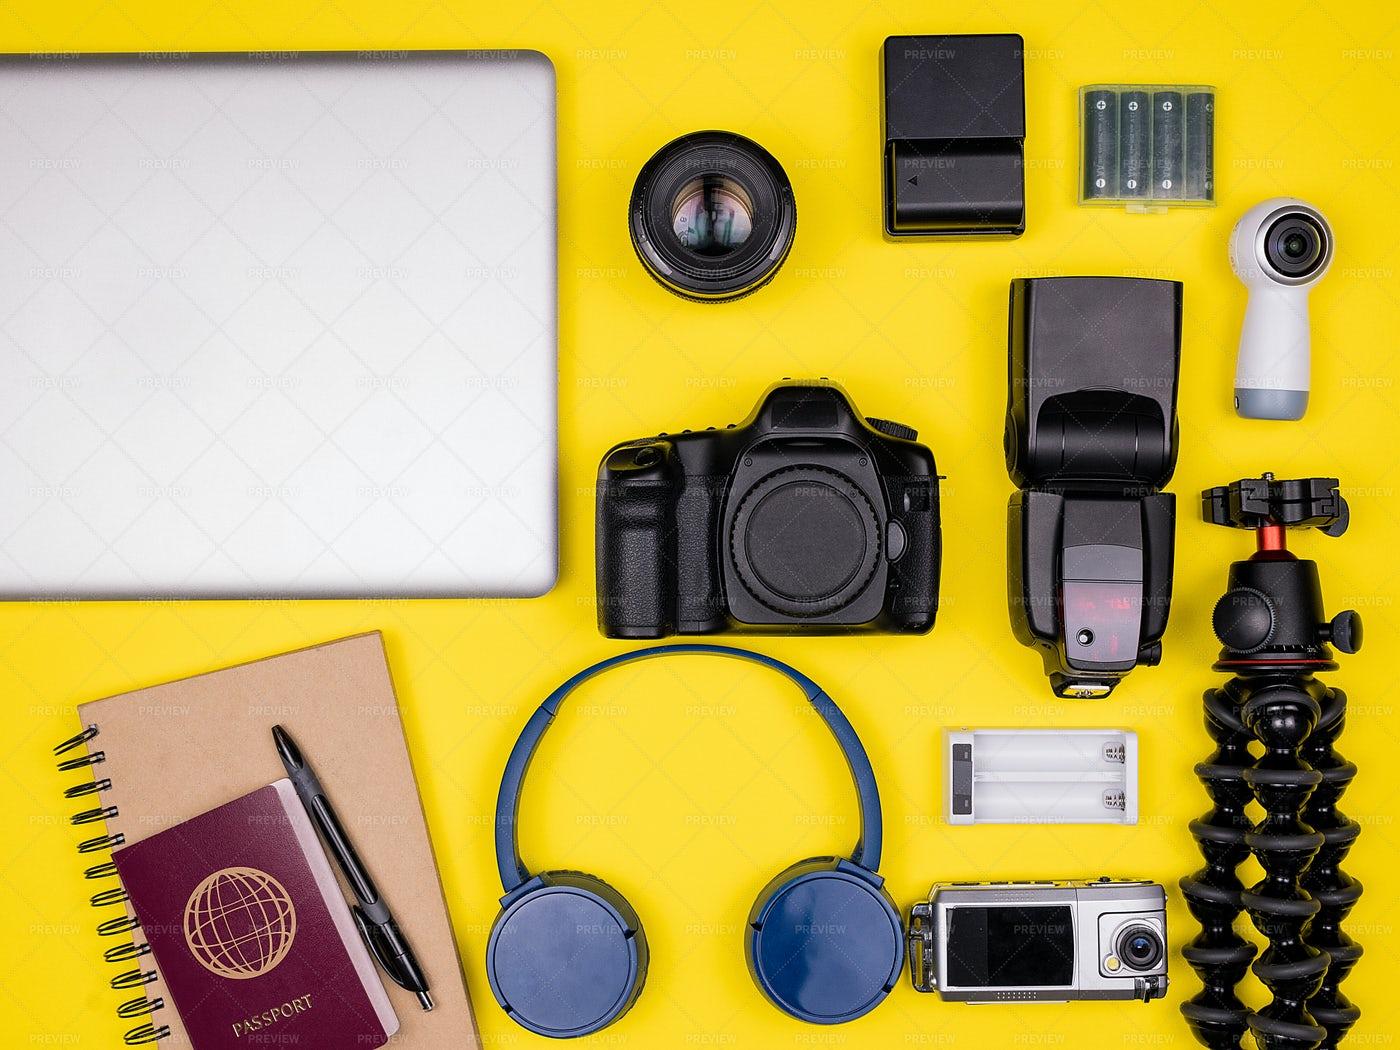 Traveler Photo Accessories: Stock Photos